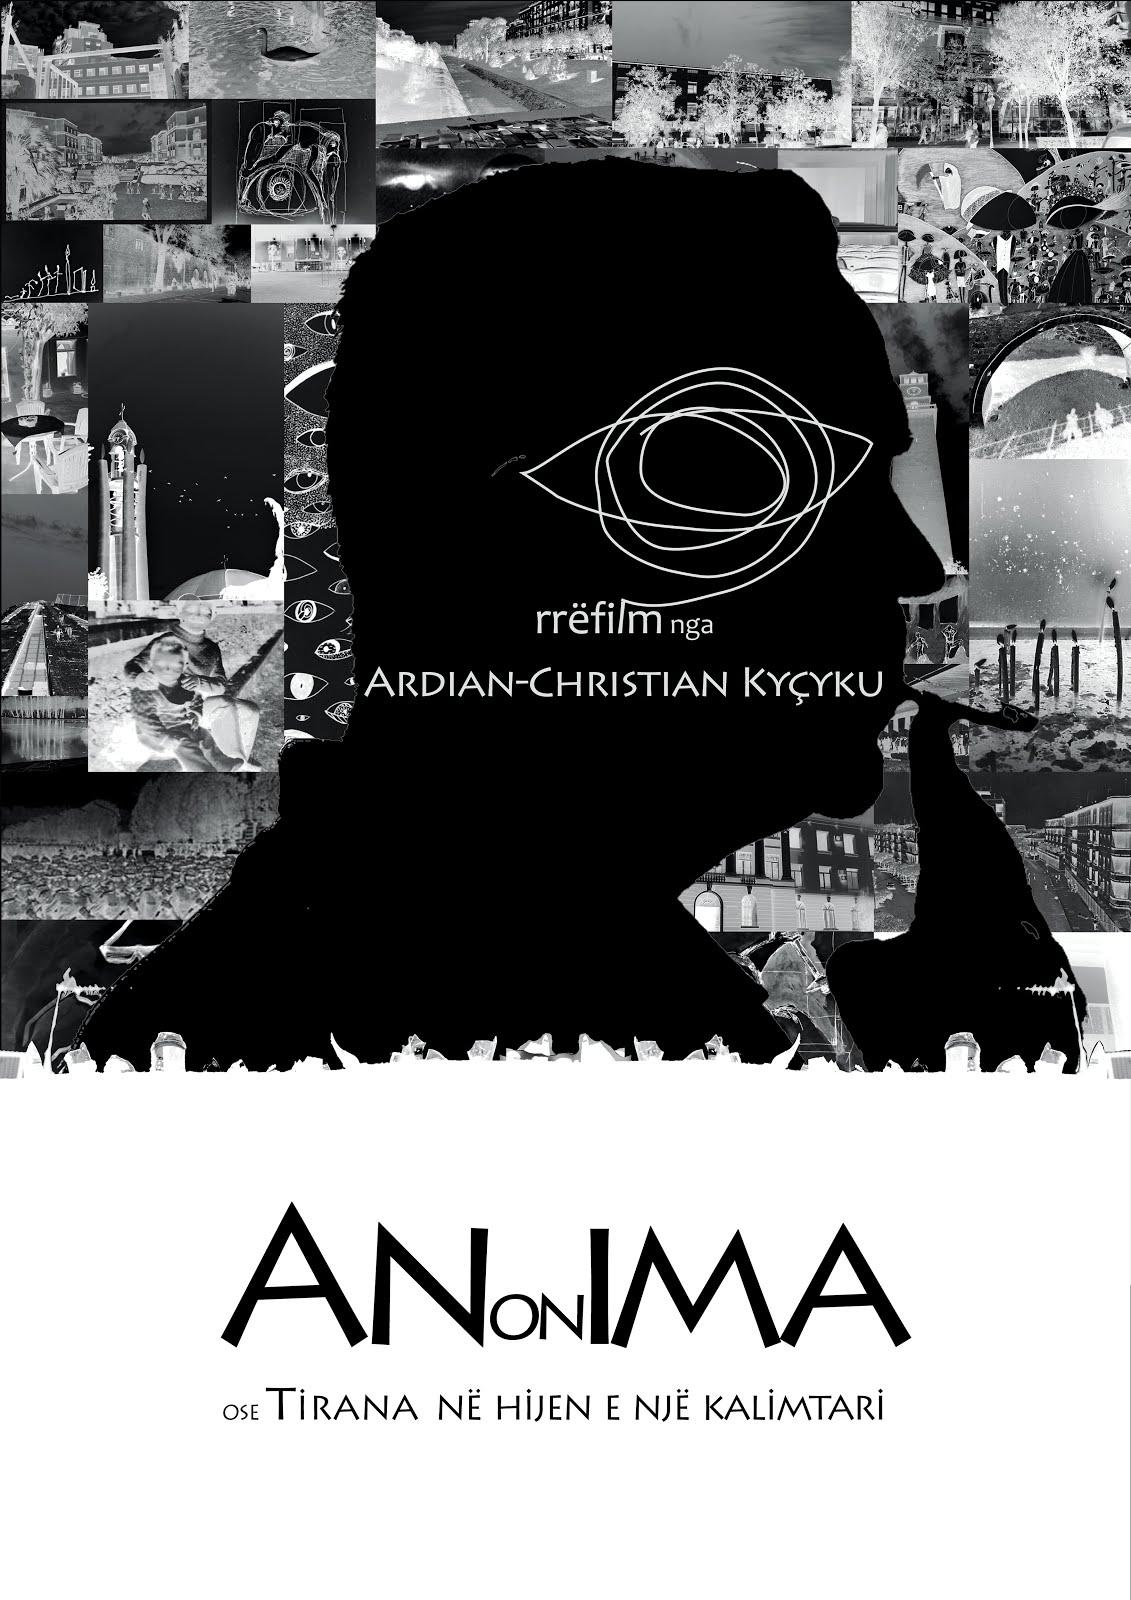 Anonima - rrëfilm